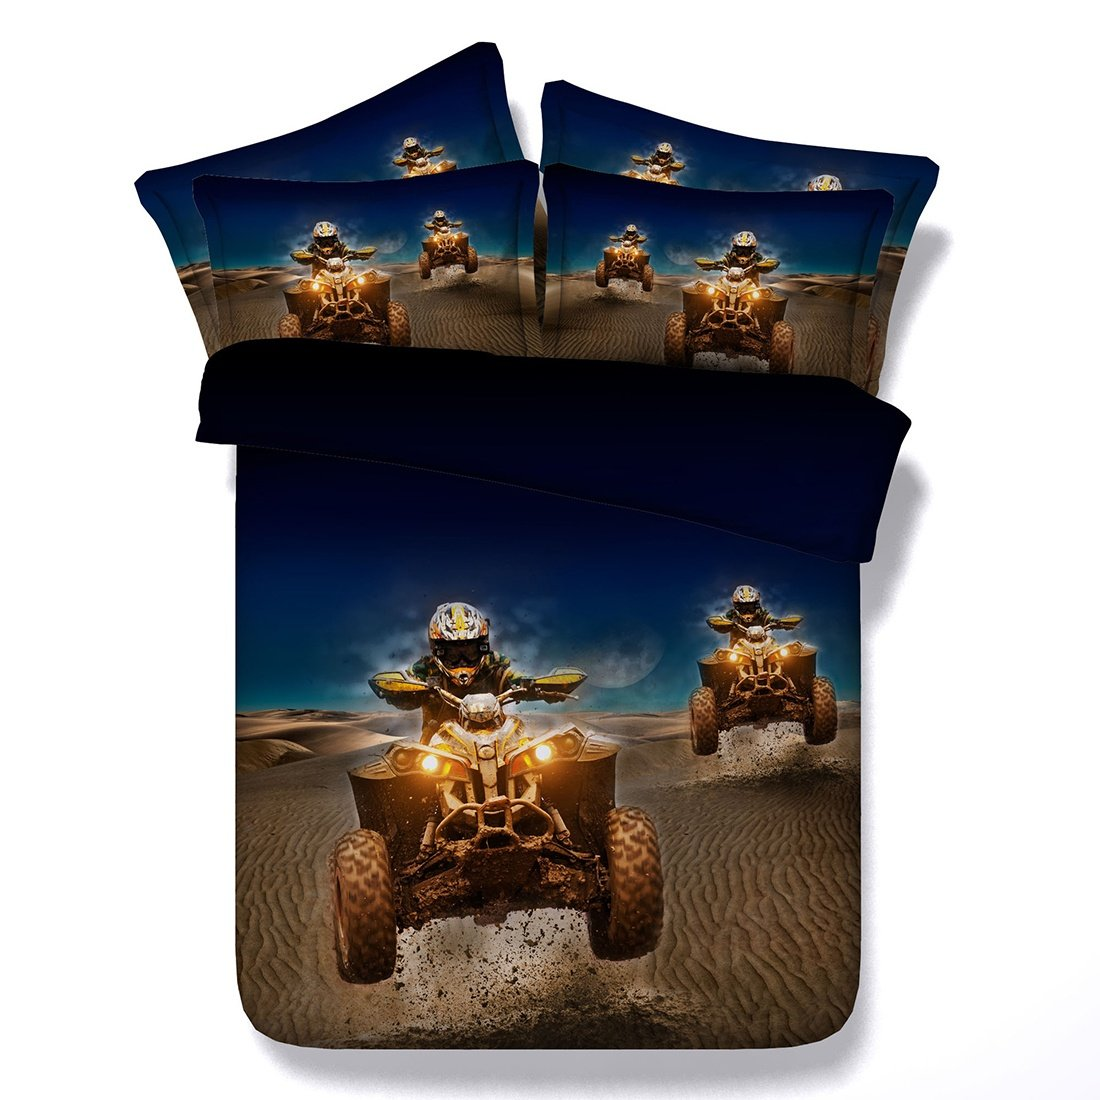 Aoeiuv Motocross Print Duvet Set Mikrofaser Königin König Für Erwachsene Kinder Teen Wohnheim Quilt 3 Teilige 1 Bettbezug, 2 Kissenbezüge, B, 200X220Cm